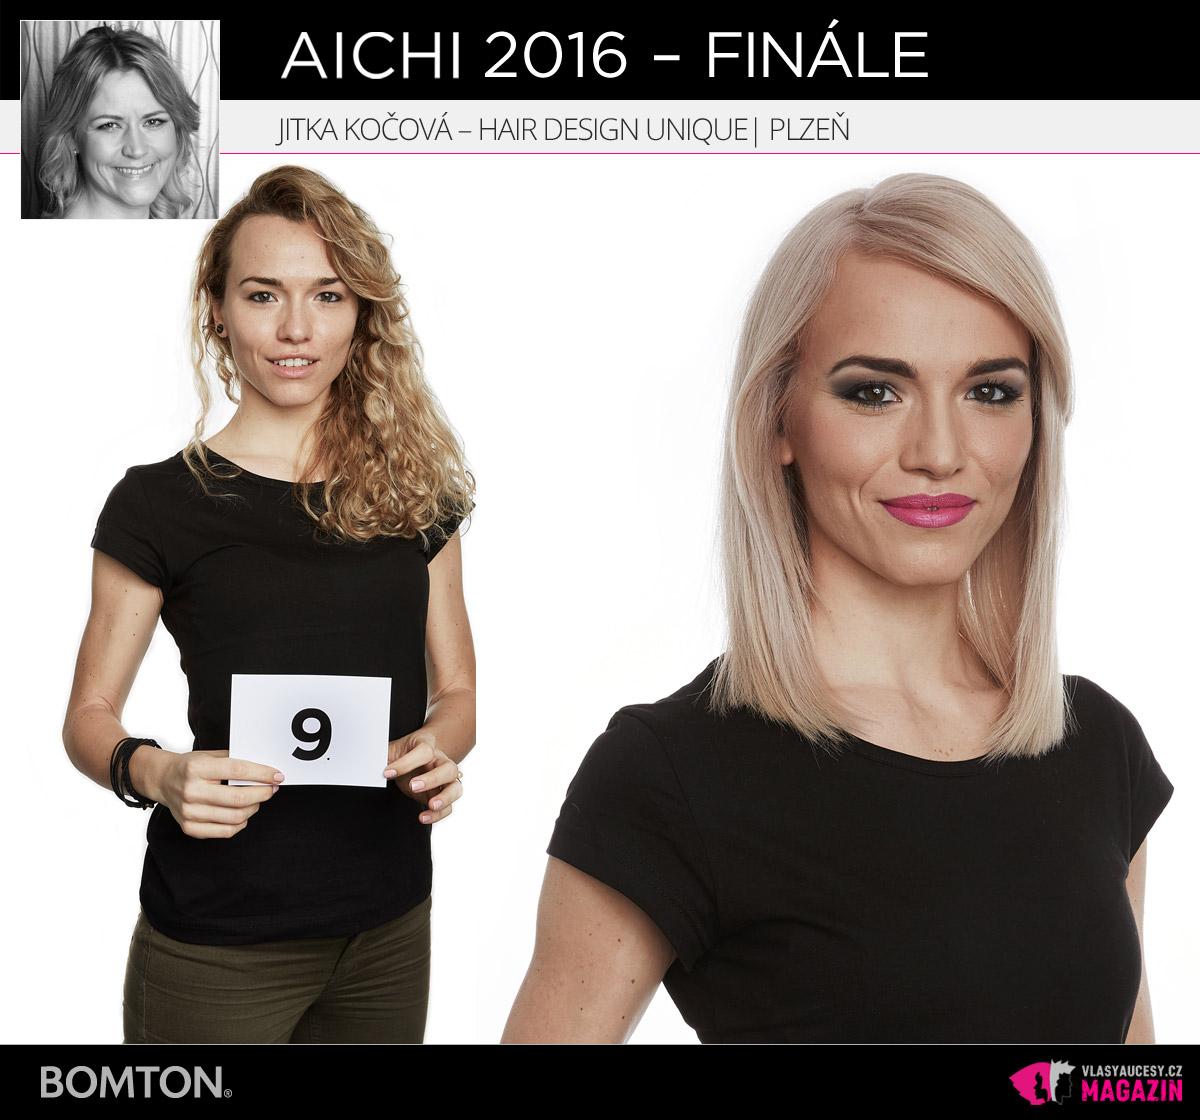 Semifinálová proměna AICHI 2016: Jitka Kočová, Hair Design Unique, Plzeň